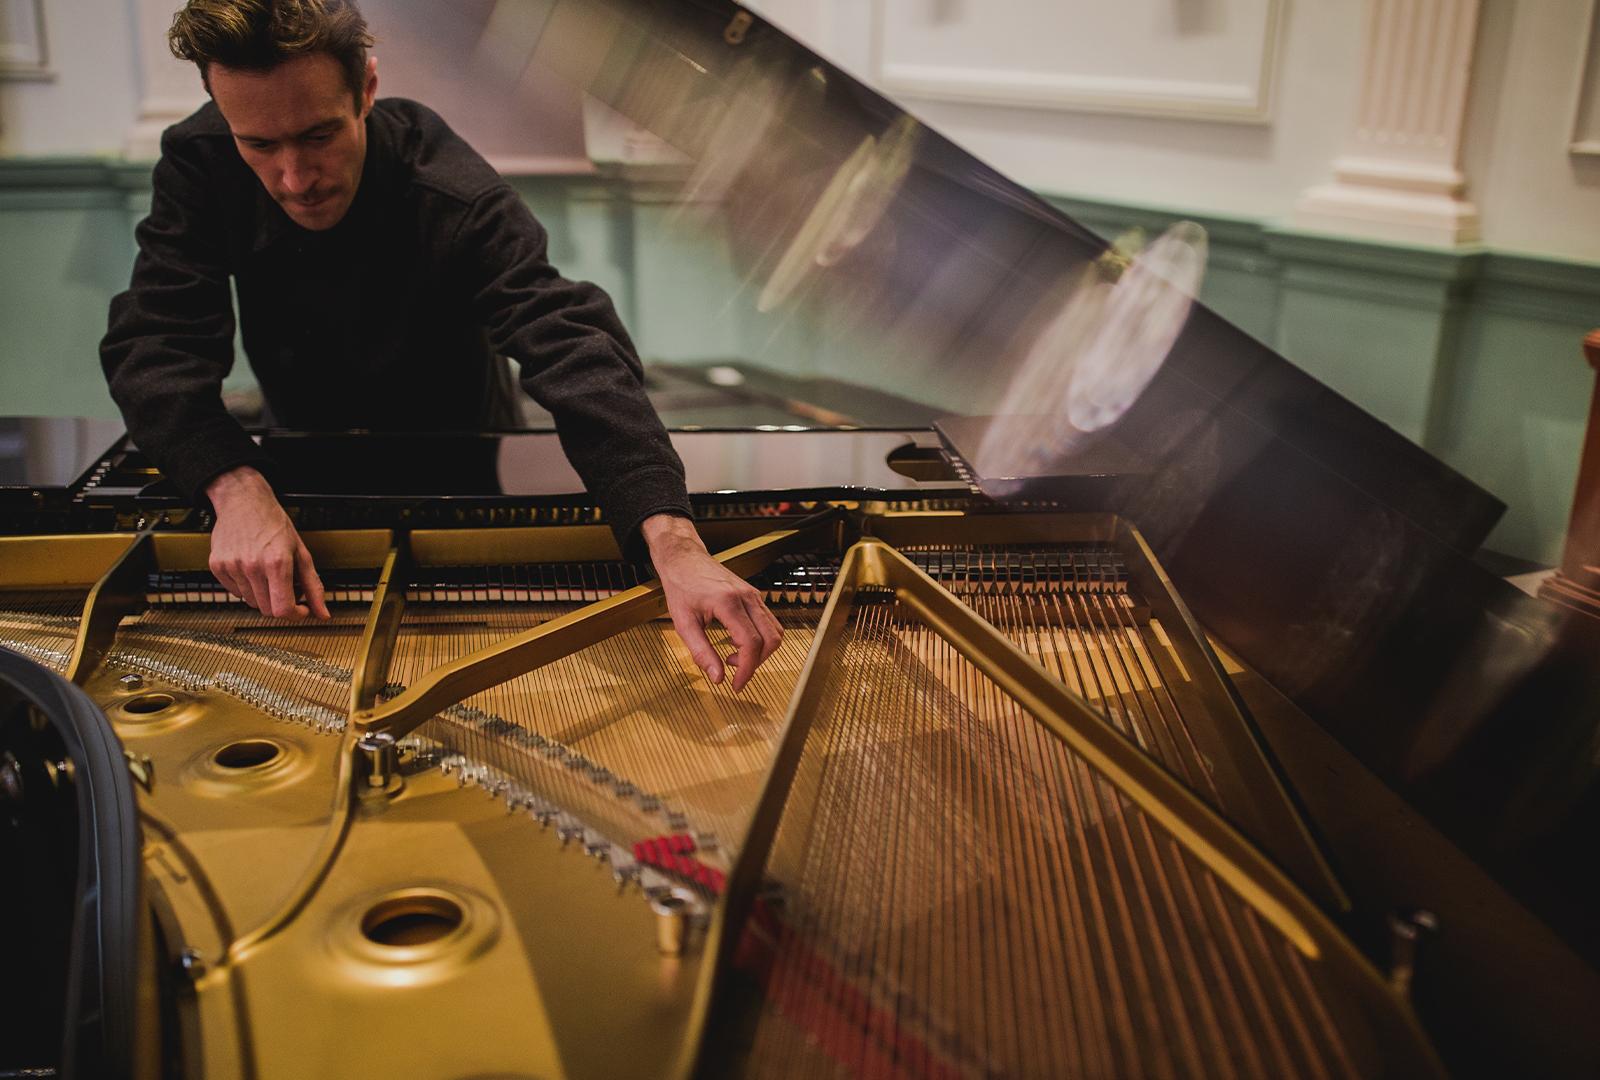 Jonny Nash & Suzanne Kraft unveil new LP.